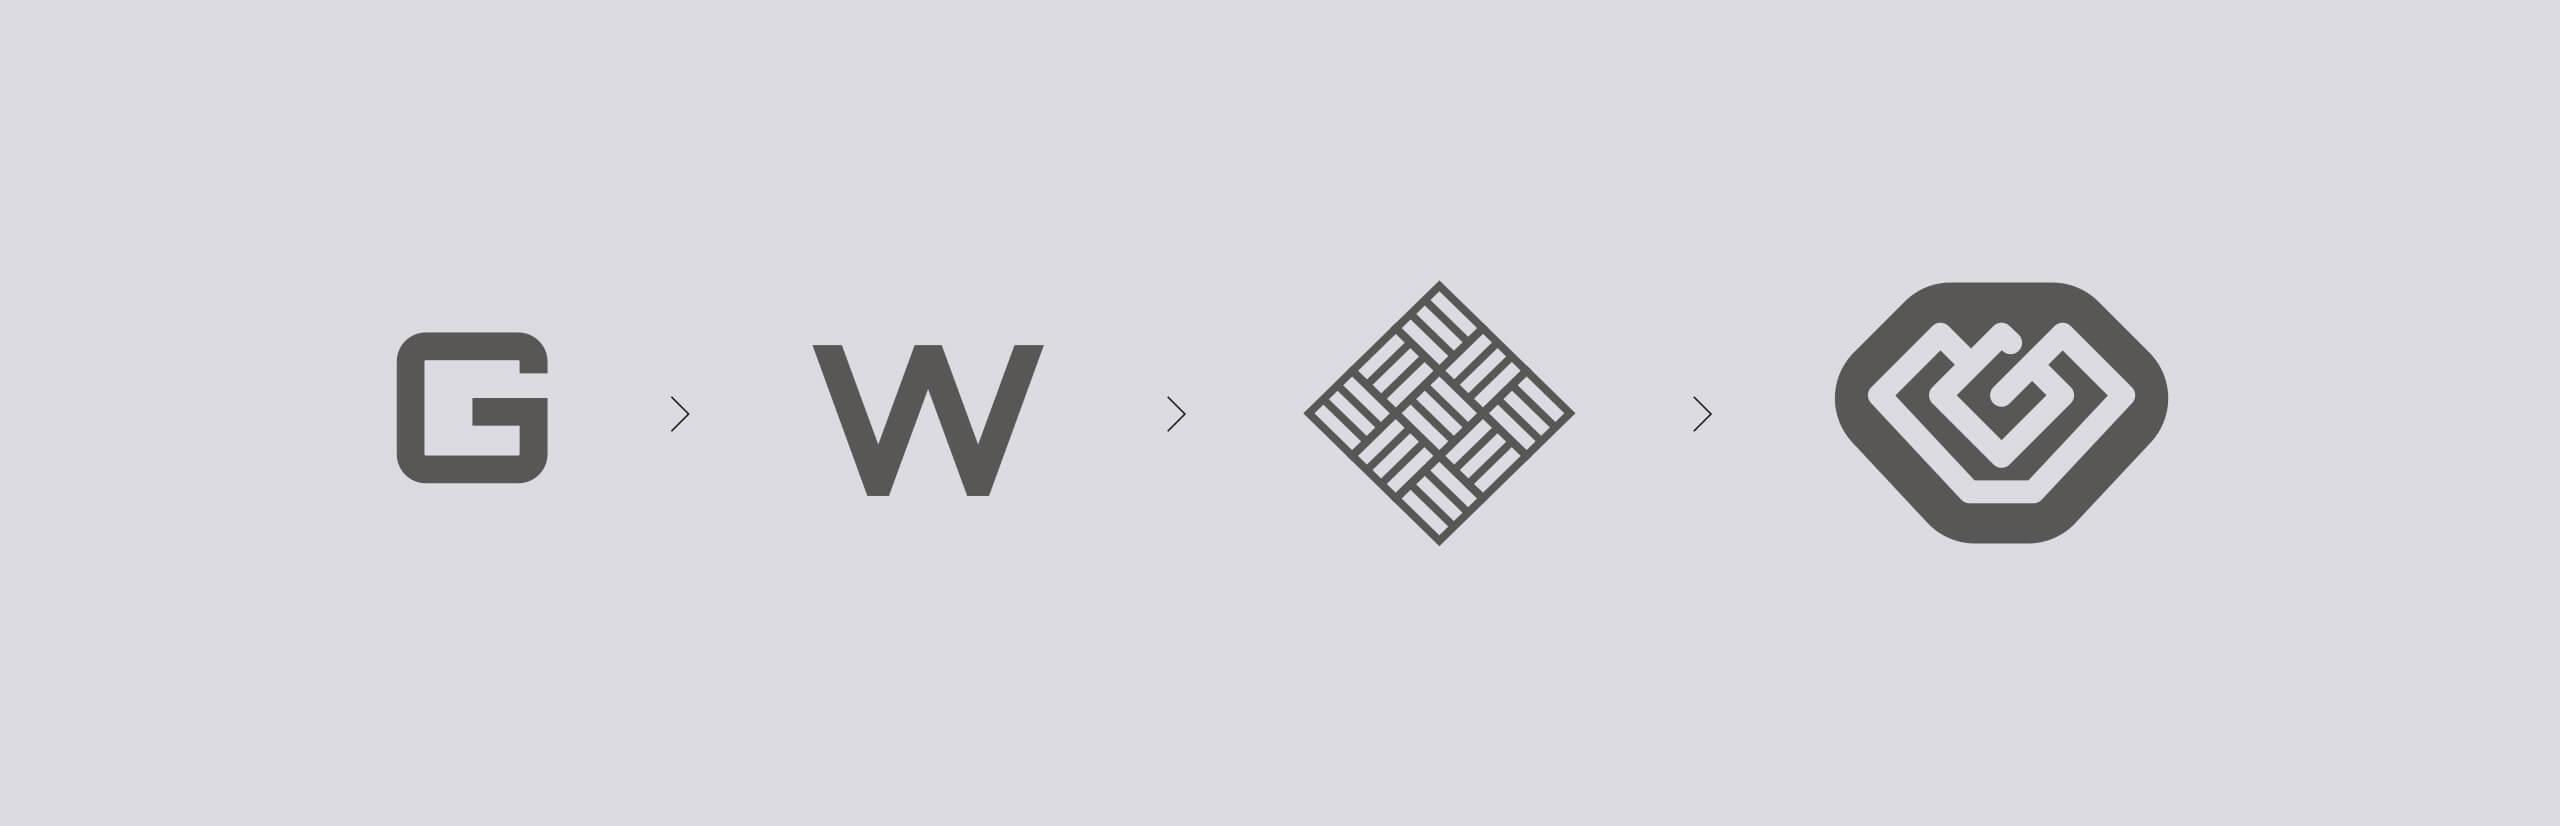 gwood_process